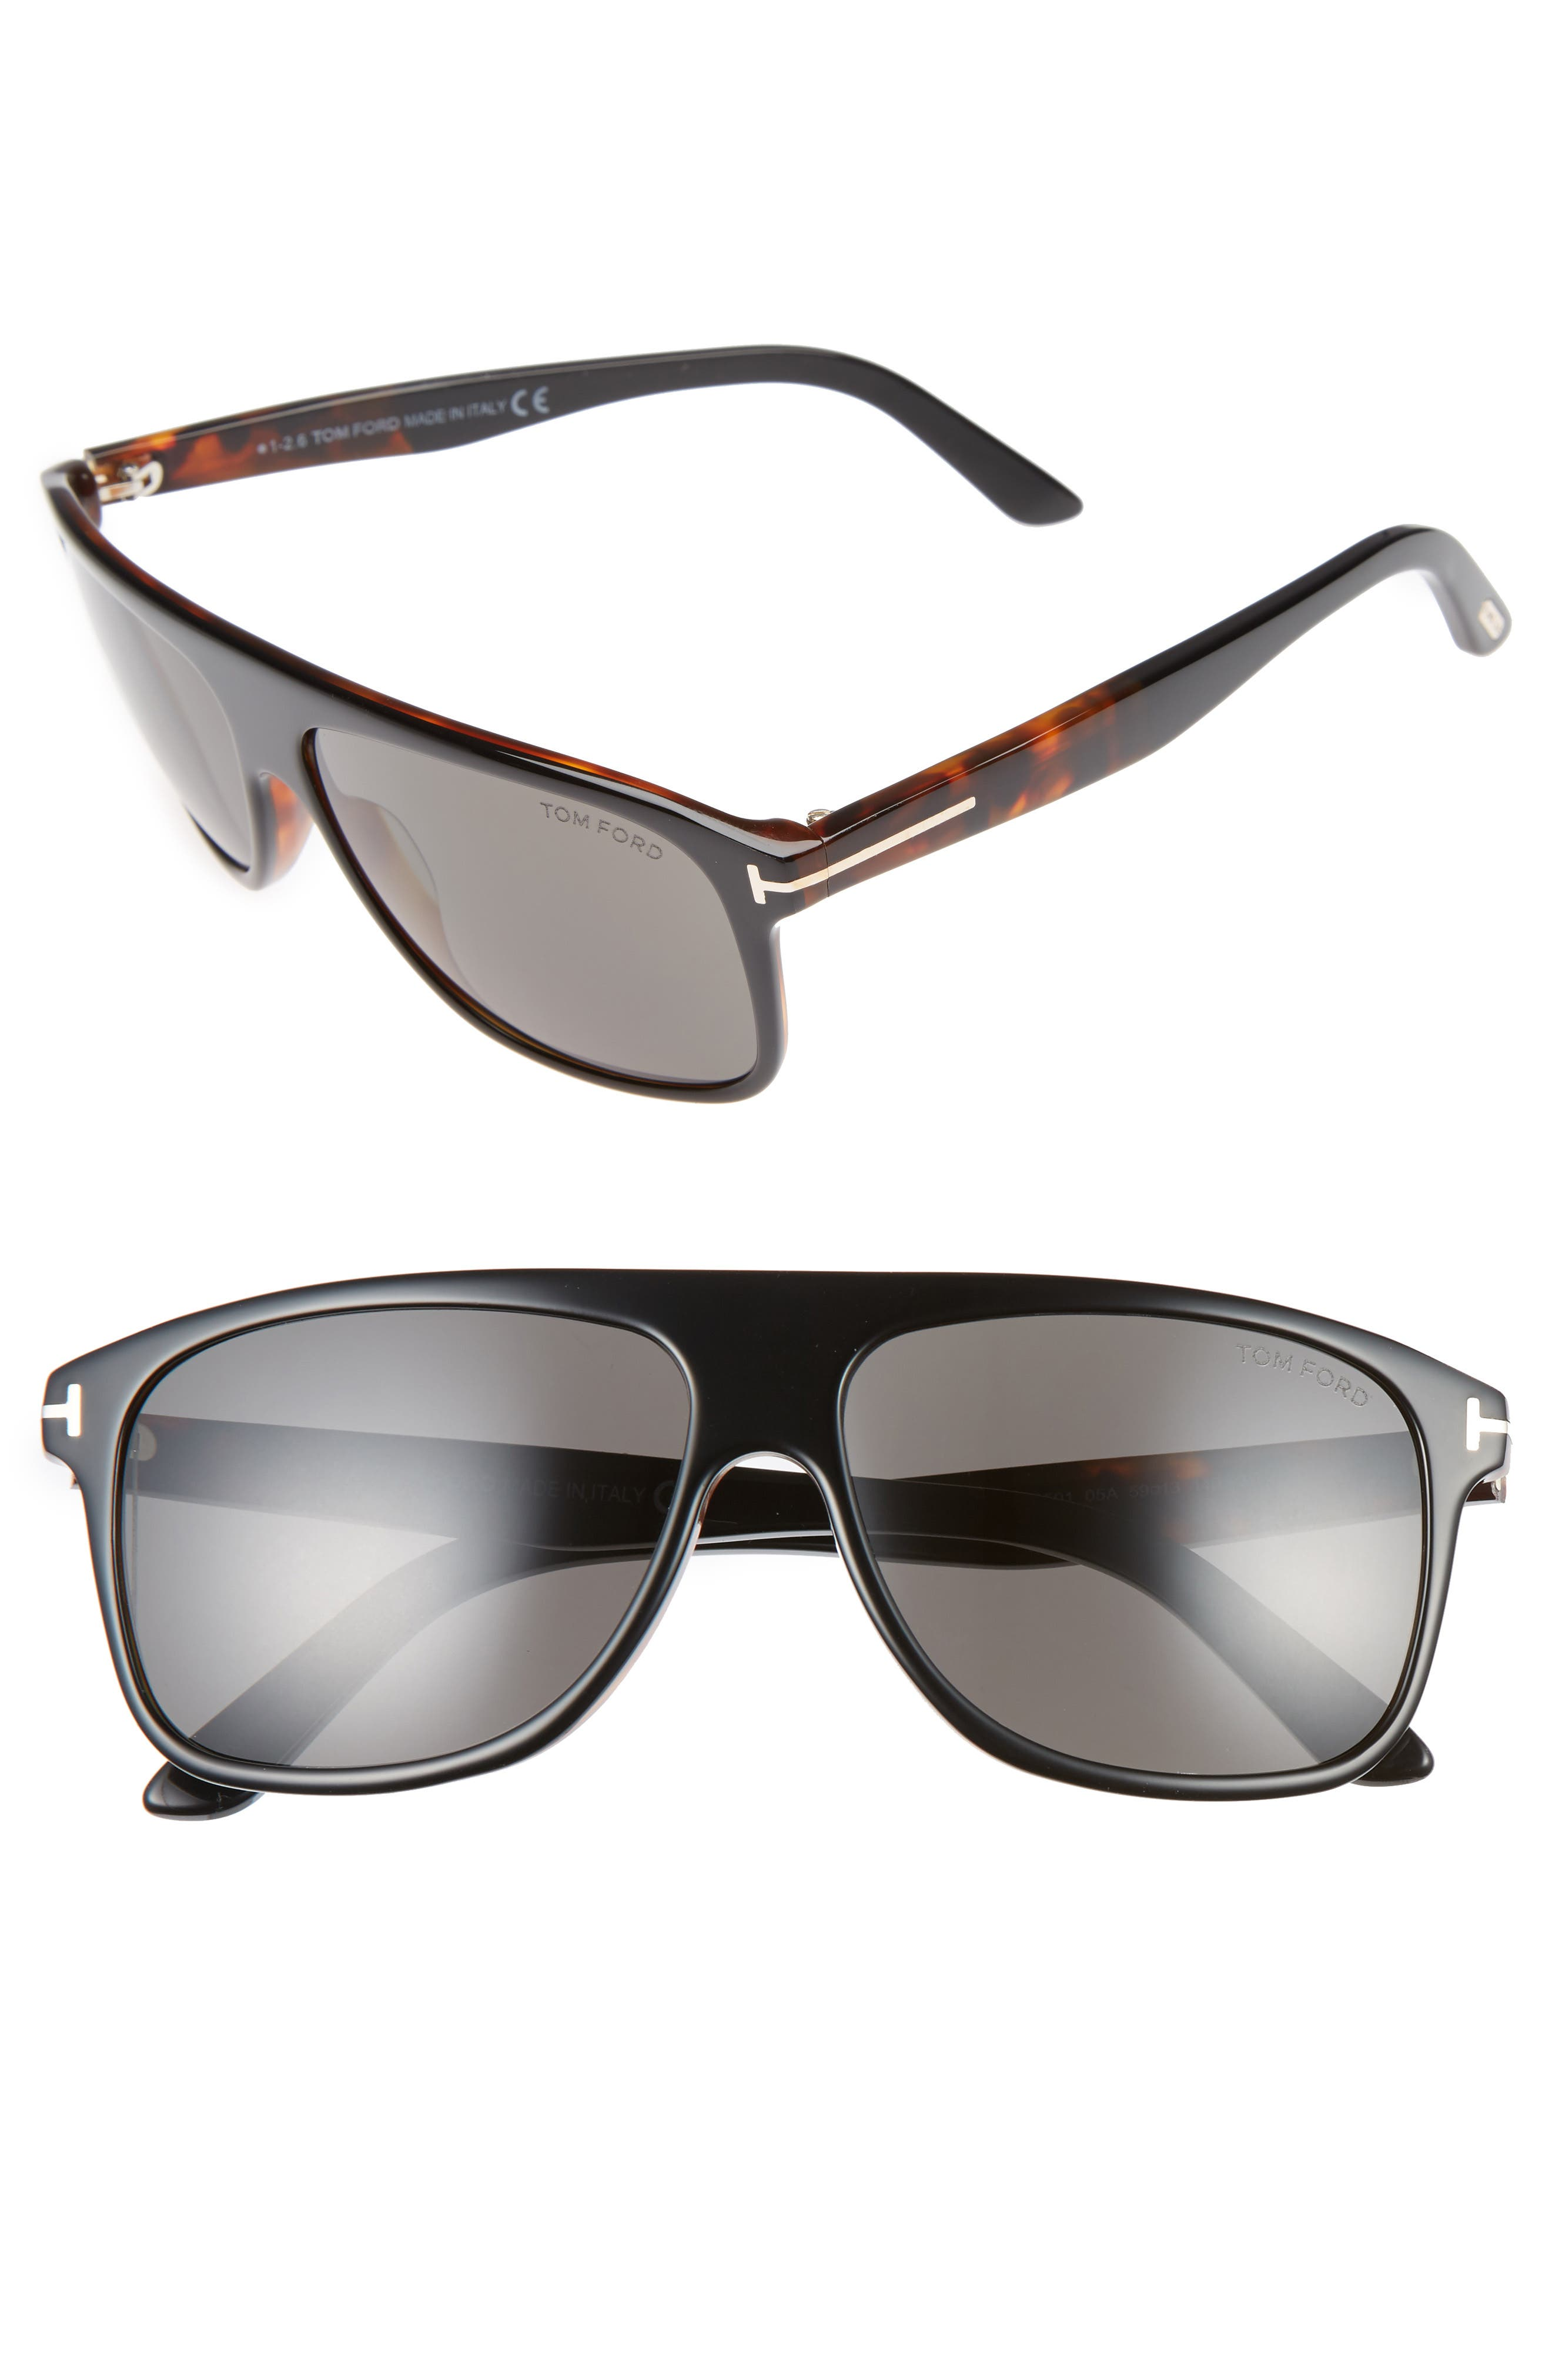 Inigo 59mm Flat Top Sunglasses,                         Main,                         color, Black/ Havana/ Smoke